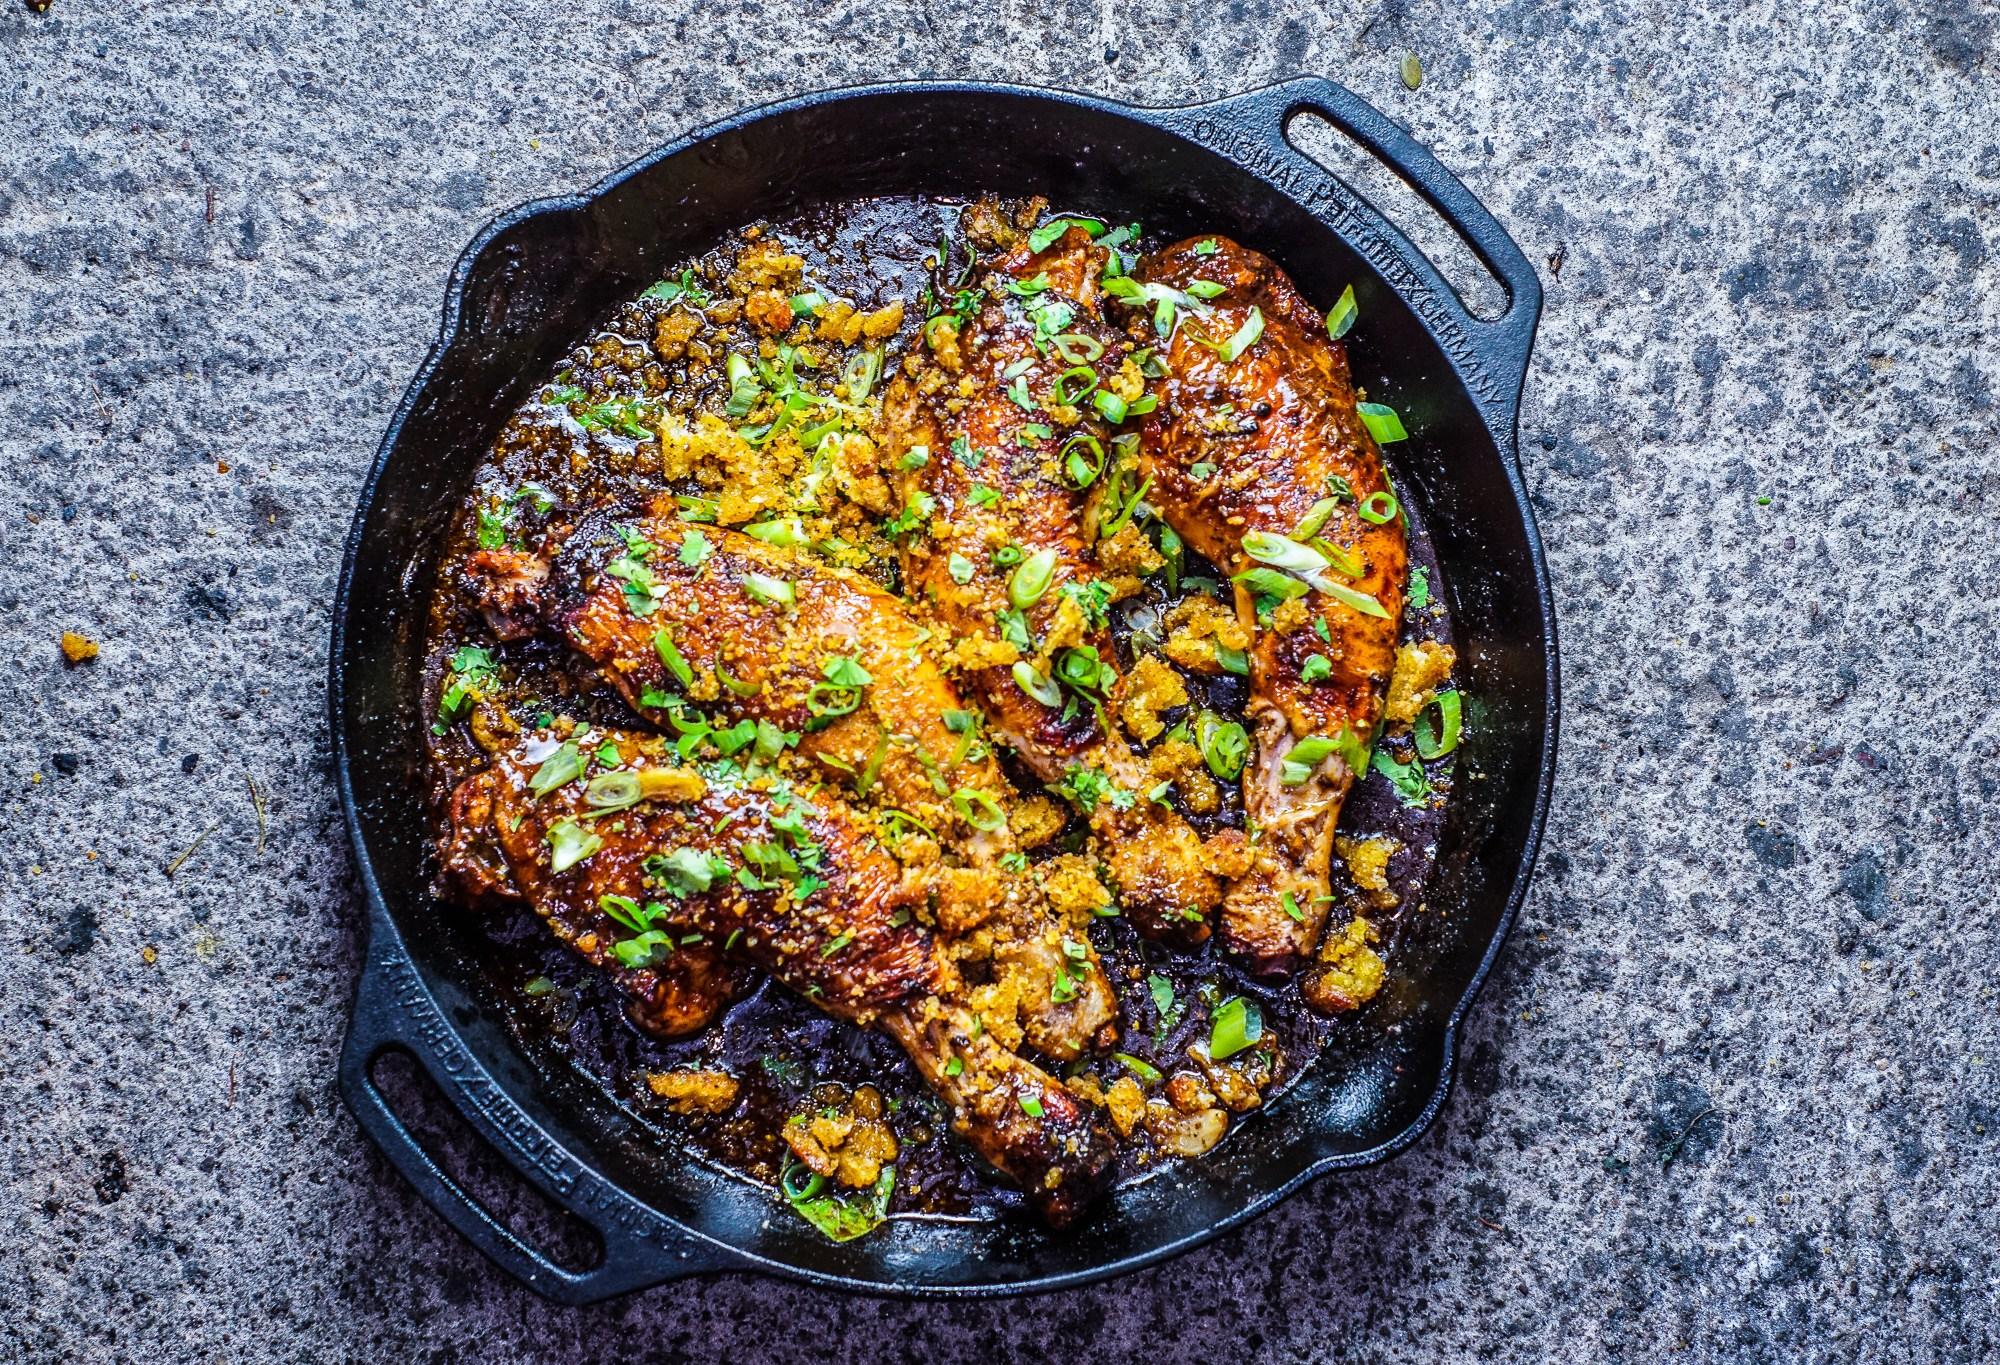 Skillet Roasted Mechoui Chicken